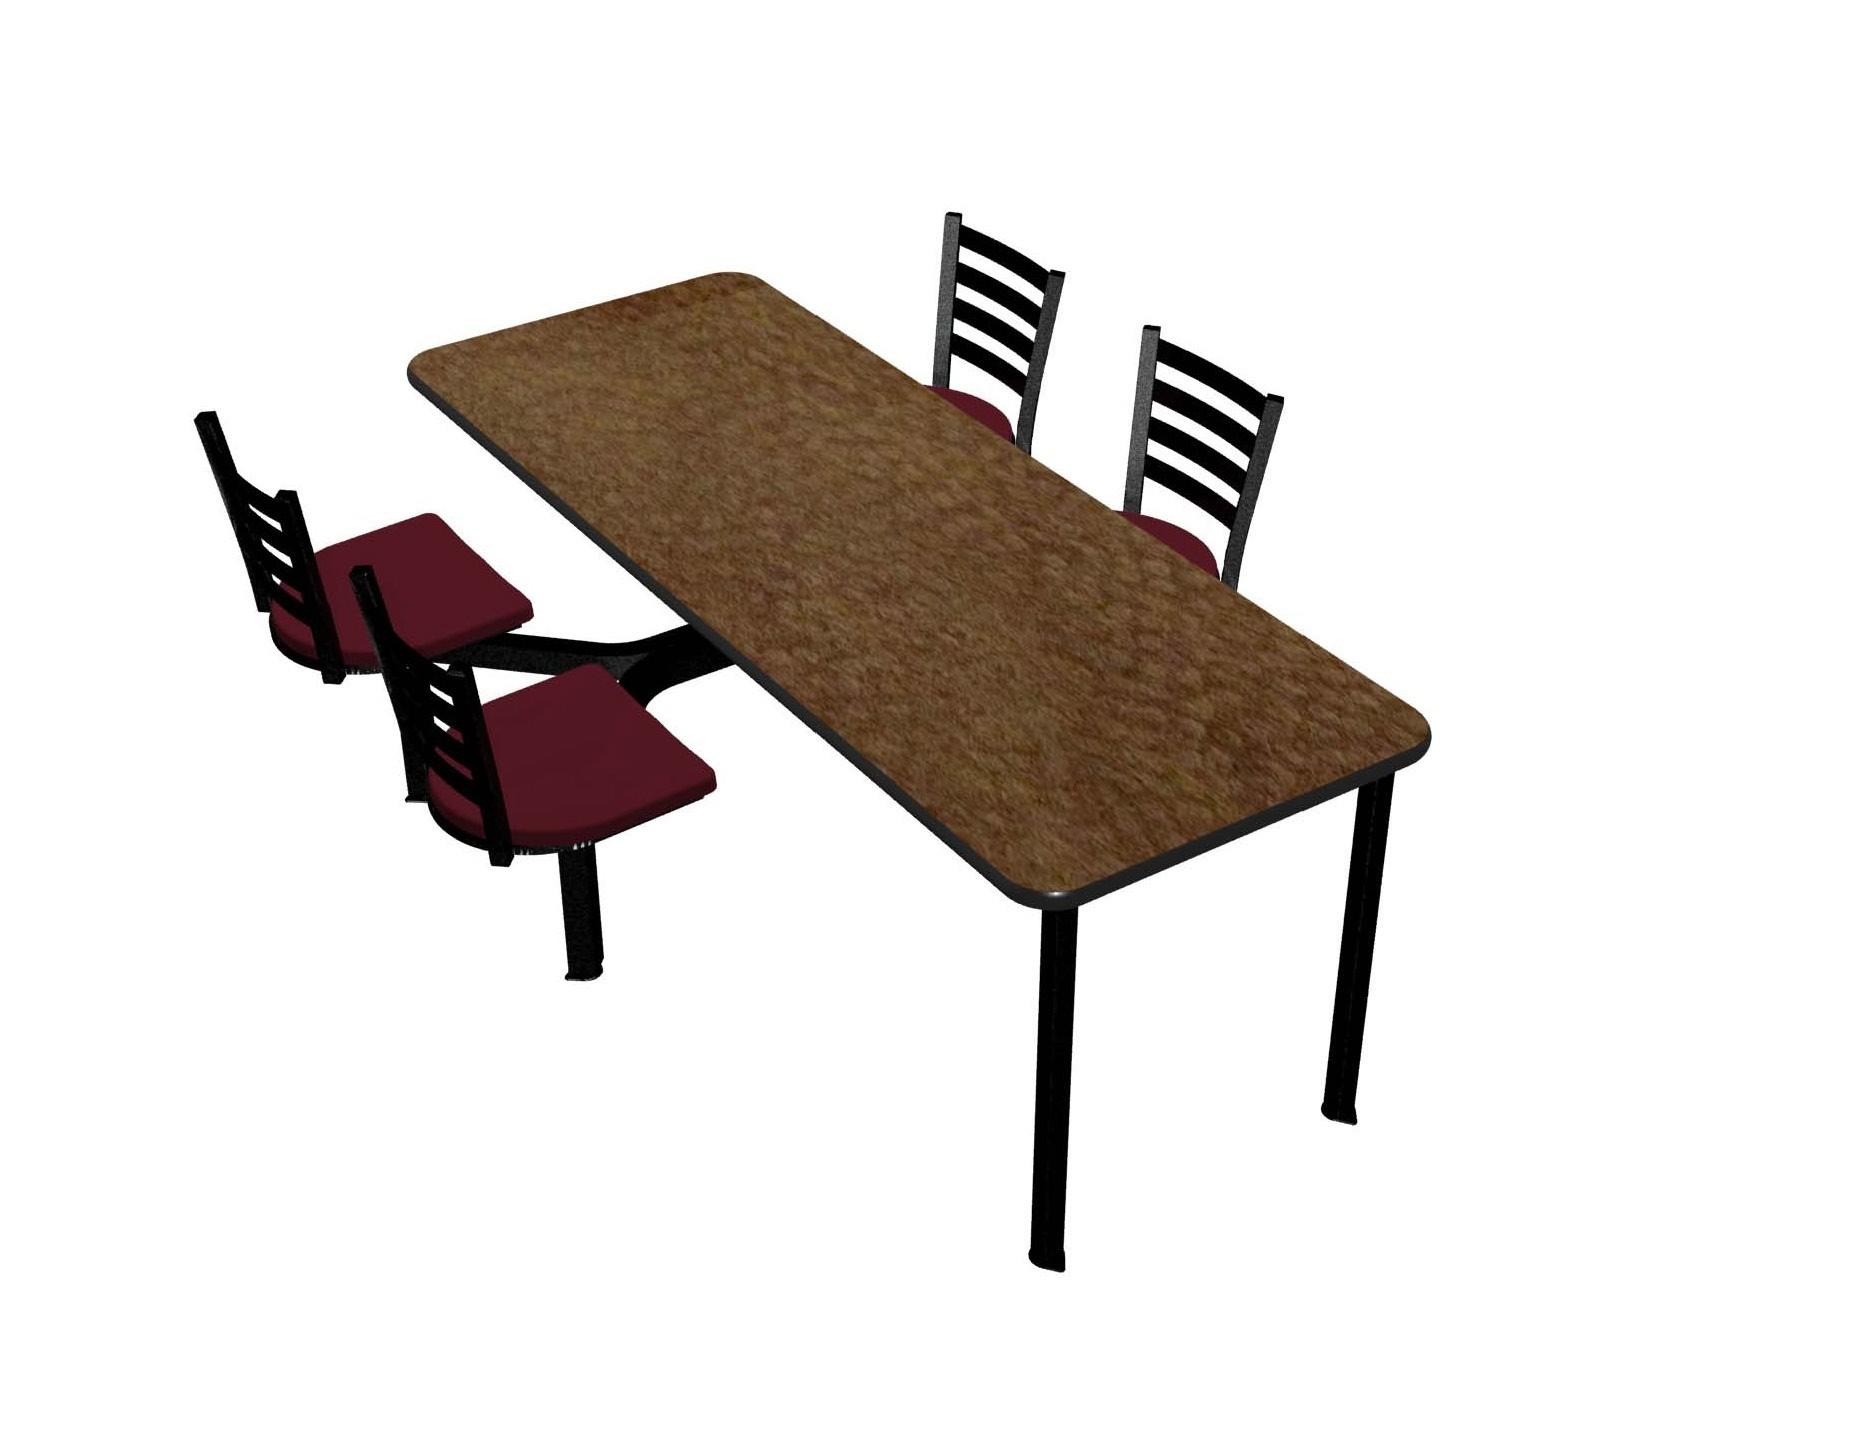 Plan ViewWindswept Bronze laminate table, Black vinyl edge, Encore chairhead with Burgundy composite seat